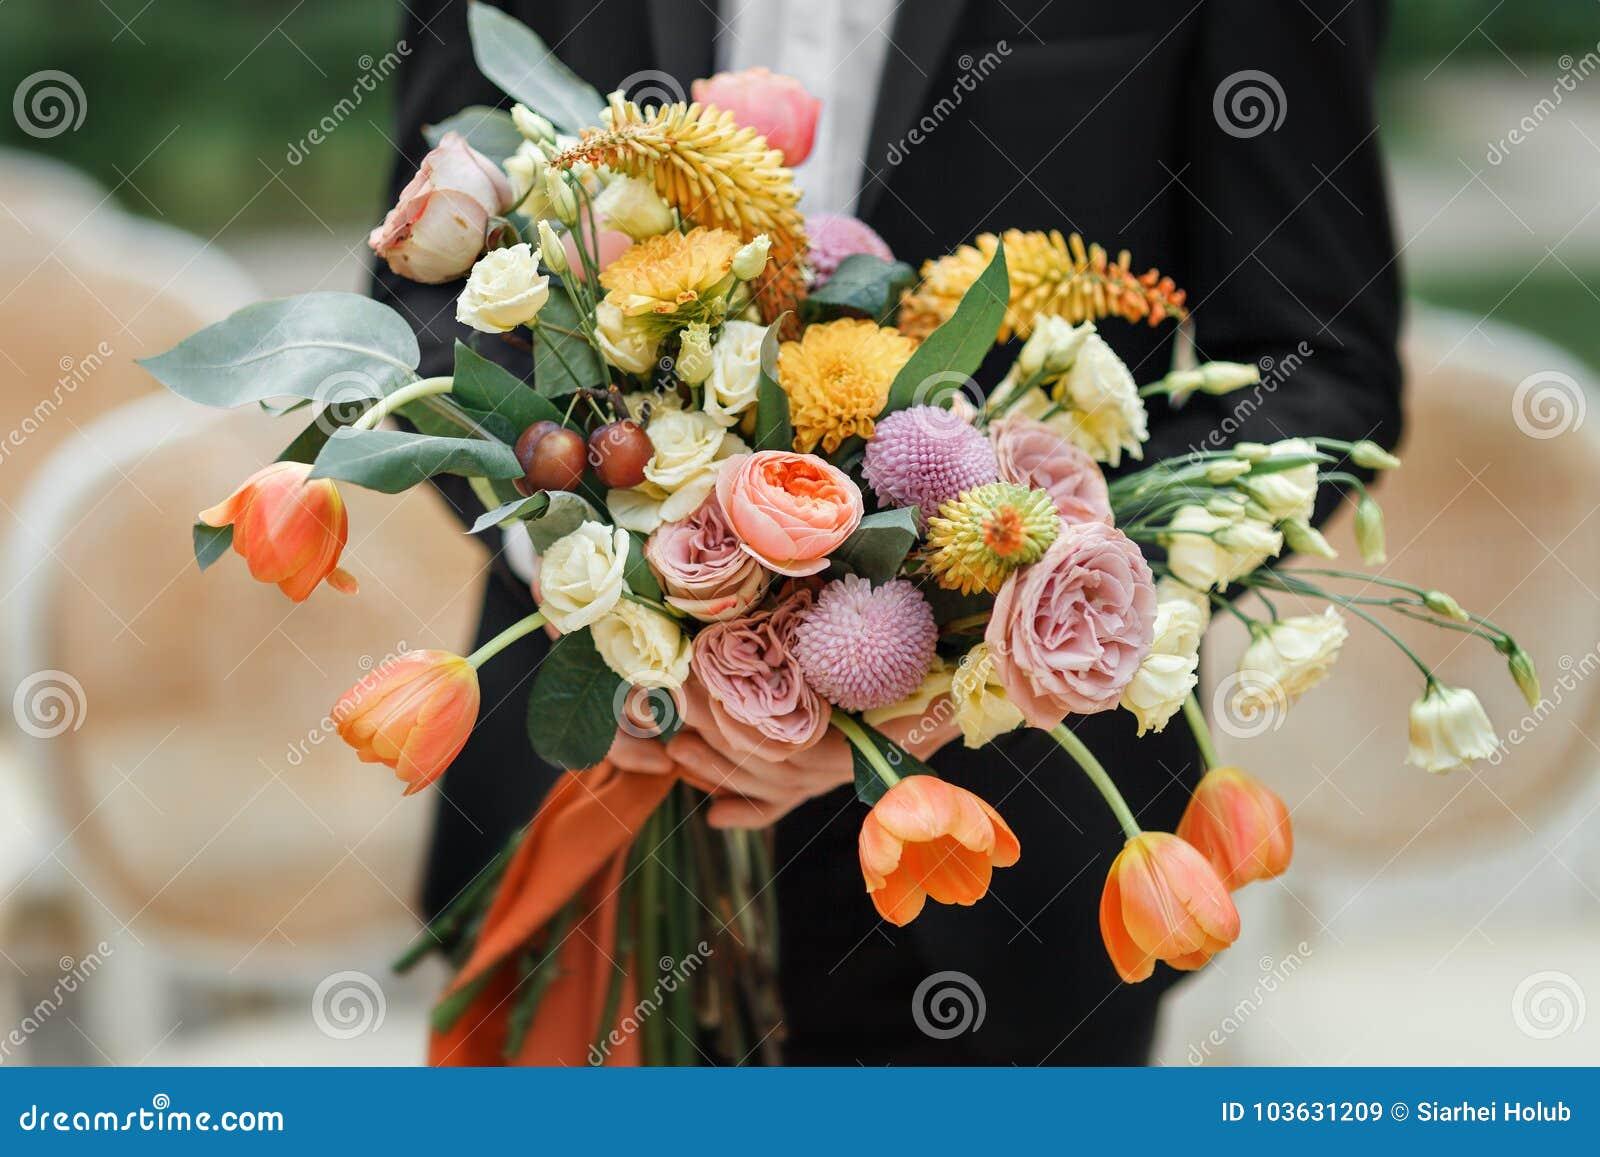 The groom hand bouquet of fresh flowers close up stock image image download the groom hand bouquet of fresh flowers close up stock image image of izmirmasajfo